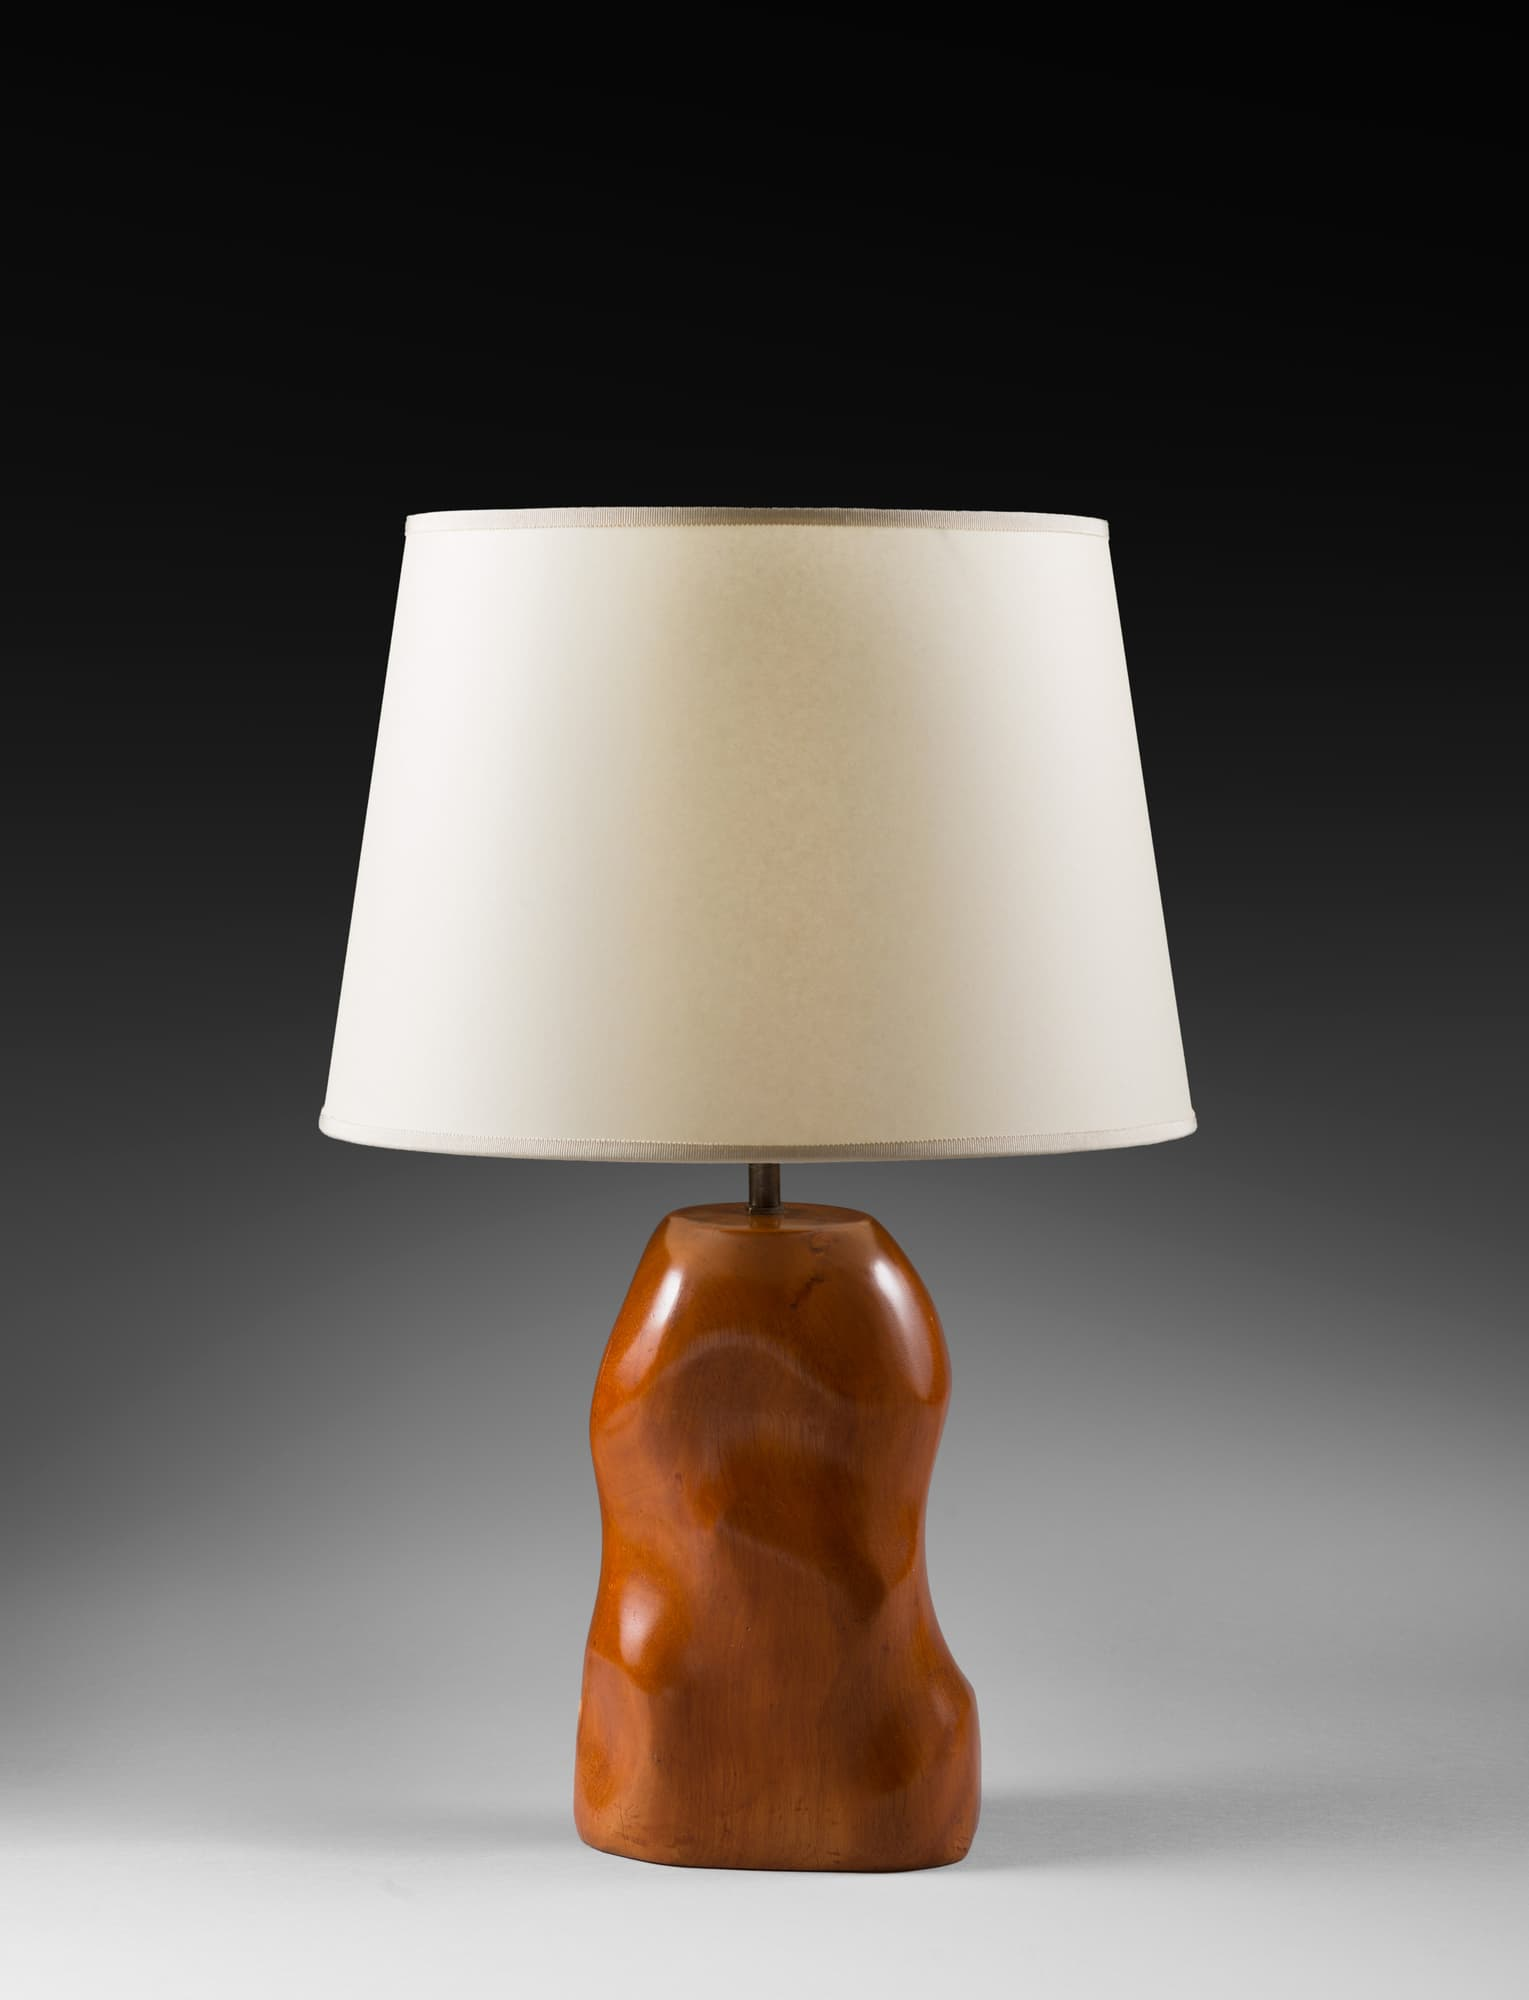 Alexandre Noll, Lampe de table, vue 01